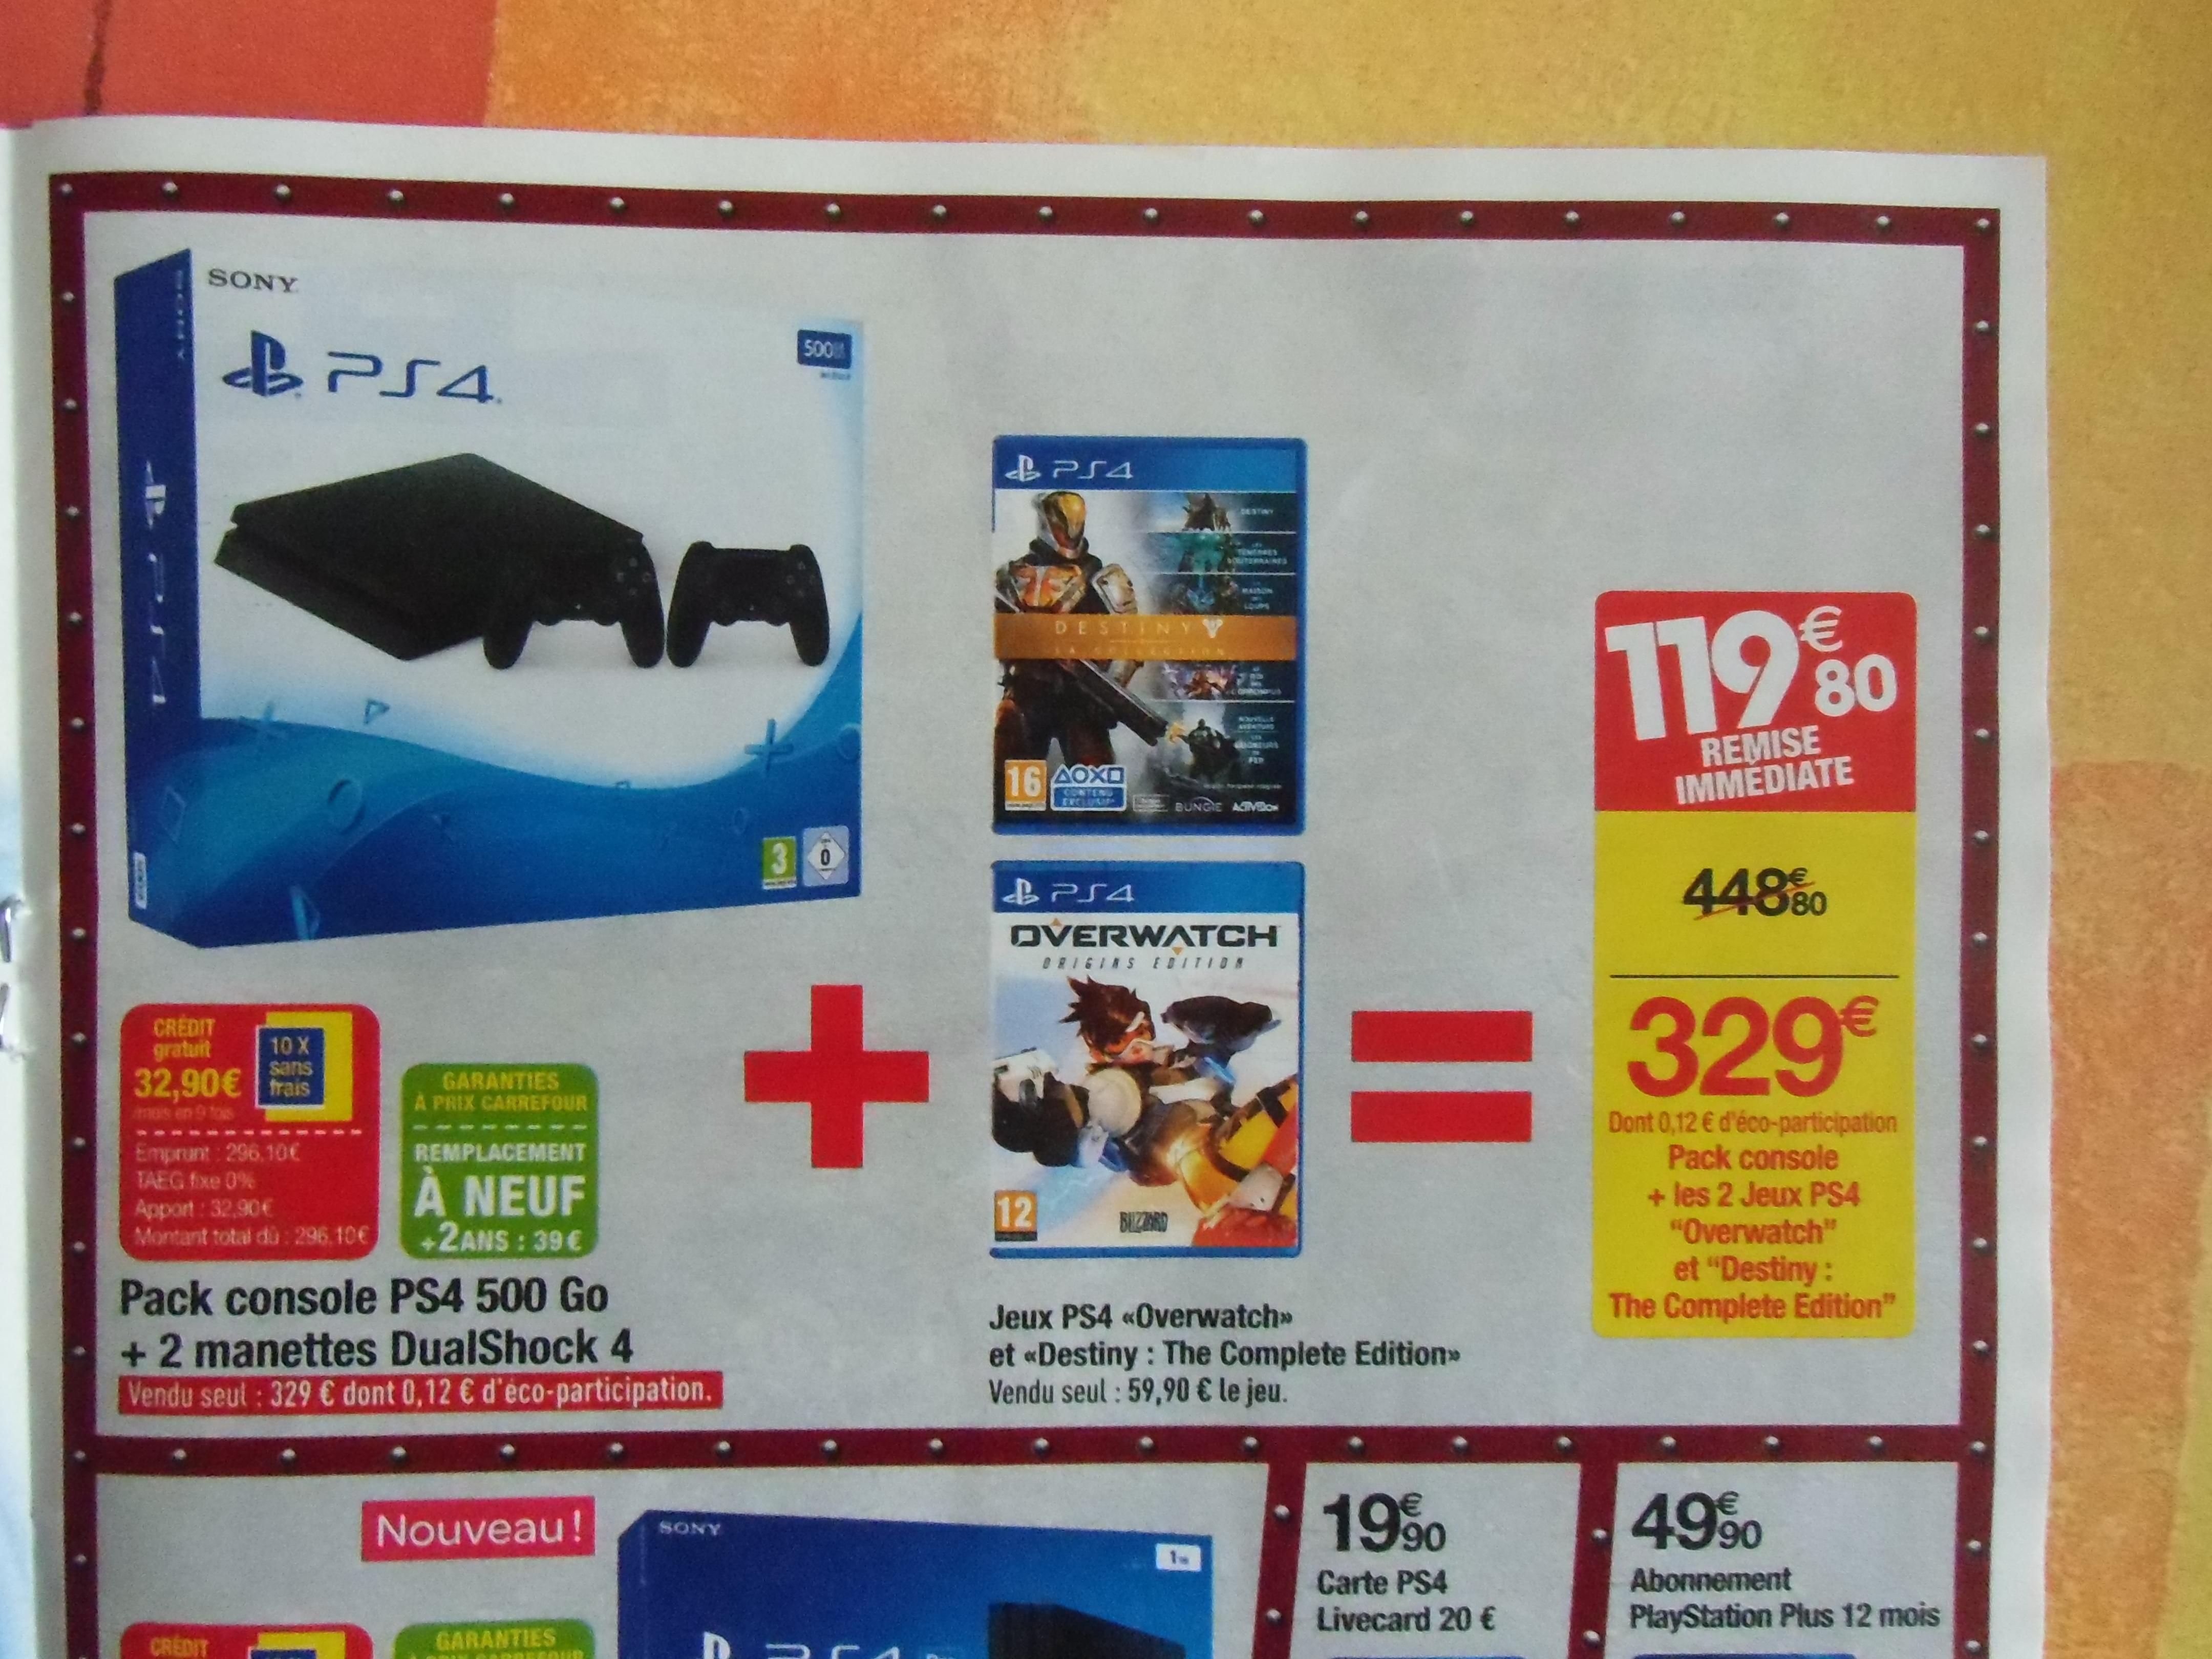 Console Sony PS4 Slim 500 Go + deuxième manette + Overwatch + Destiny : The Complete Edition